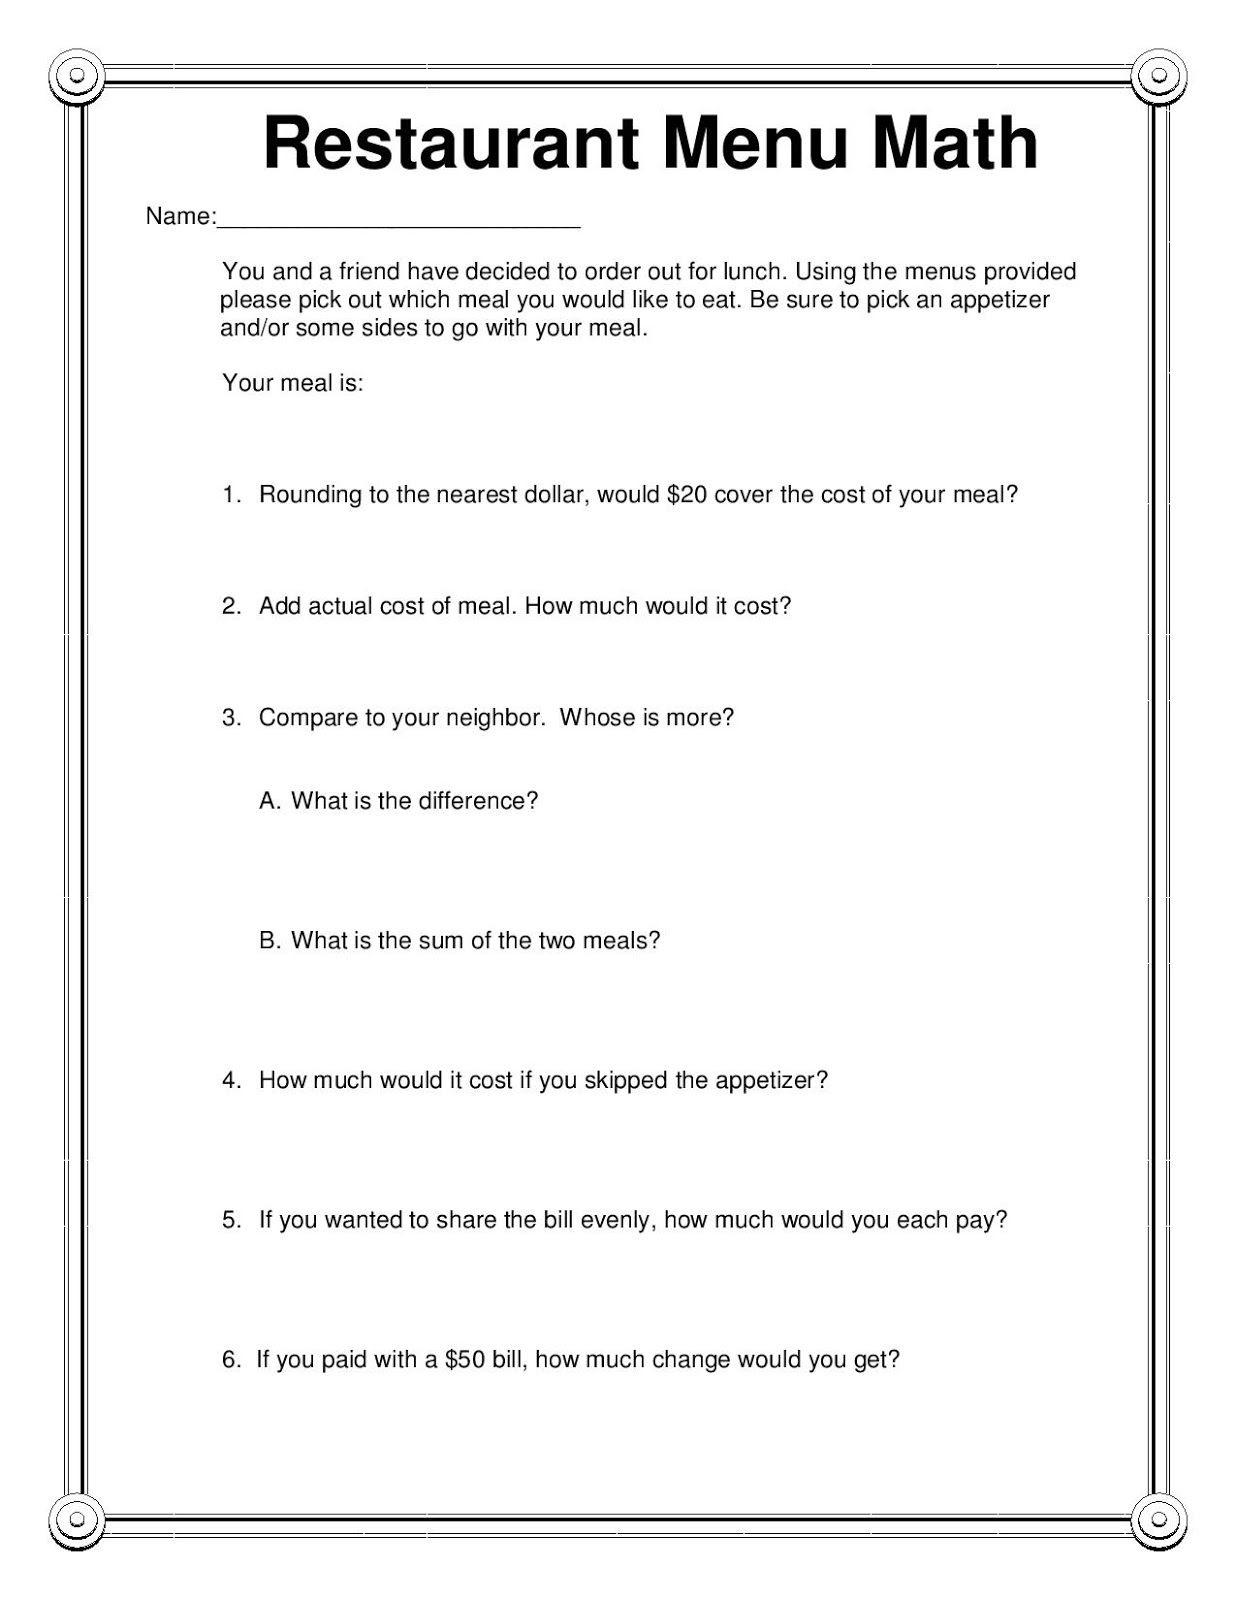 Restaurant Menu Math Freebie | Things For My Classroom | Elementary - Free Printable Menu Math Worksheets